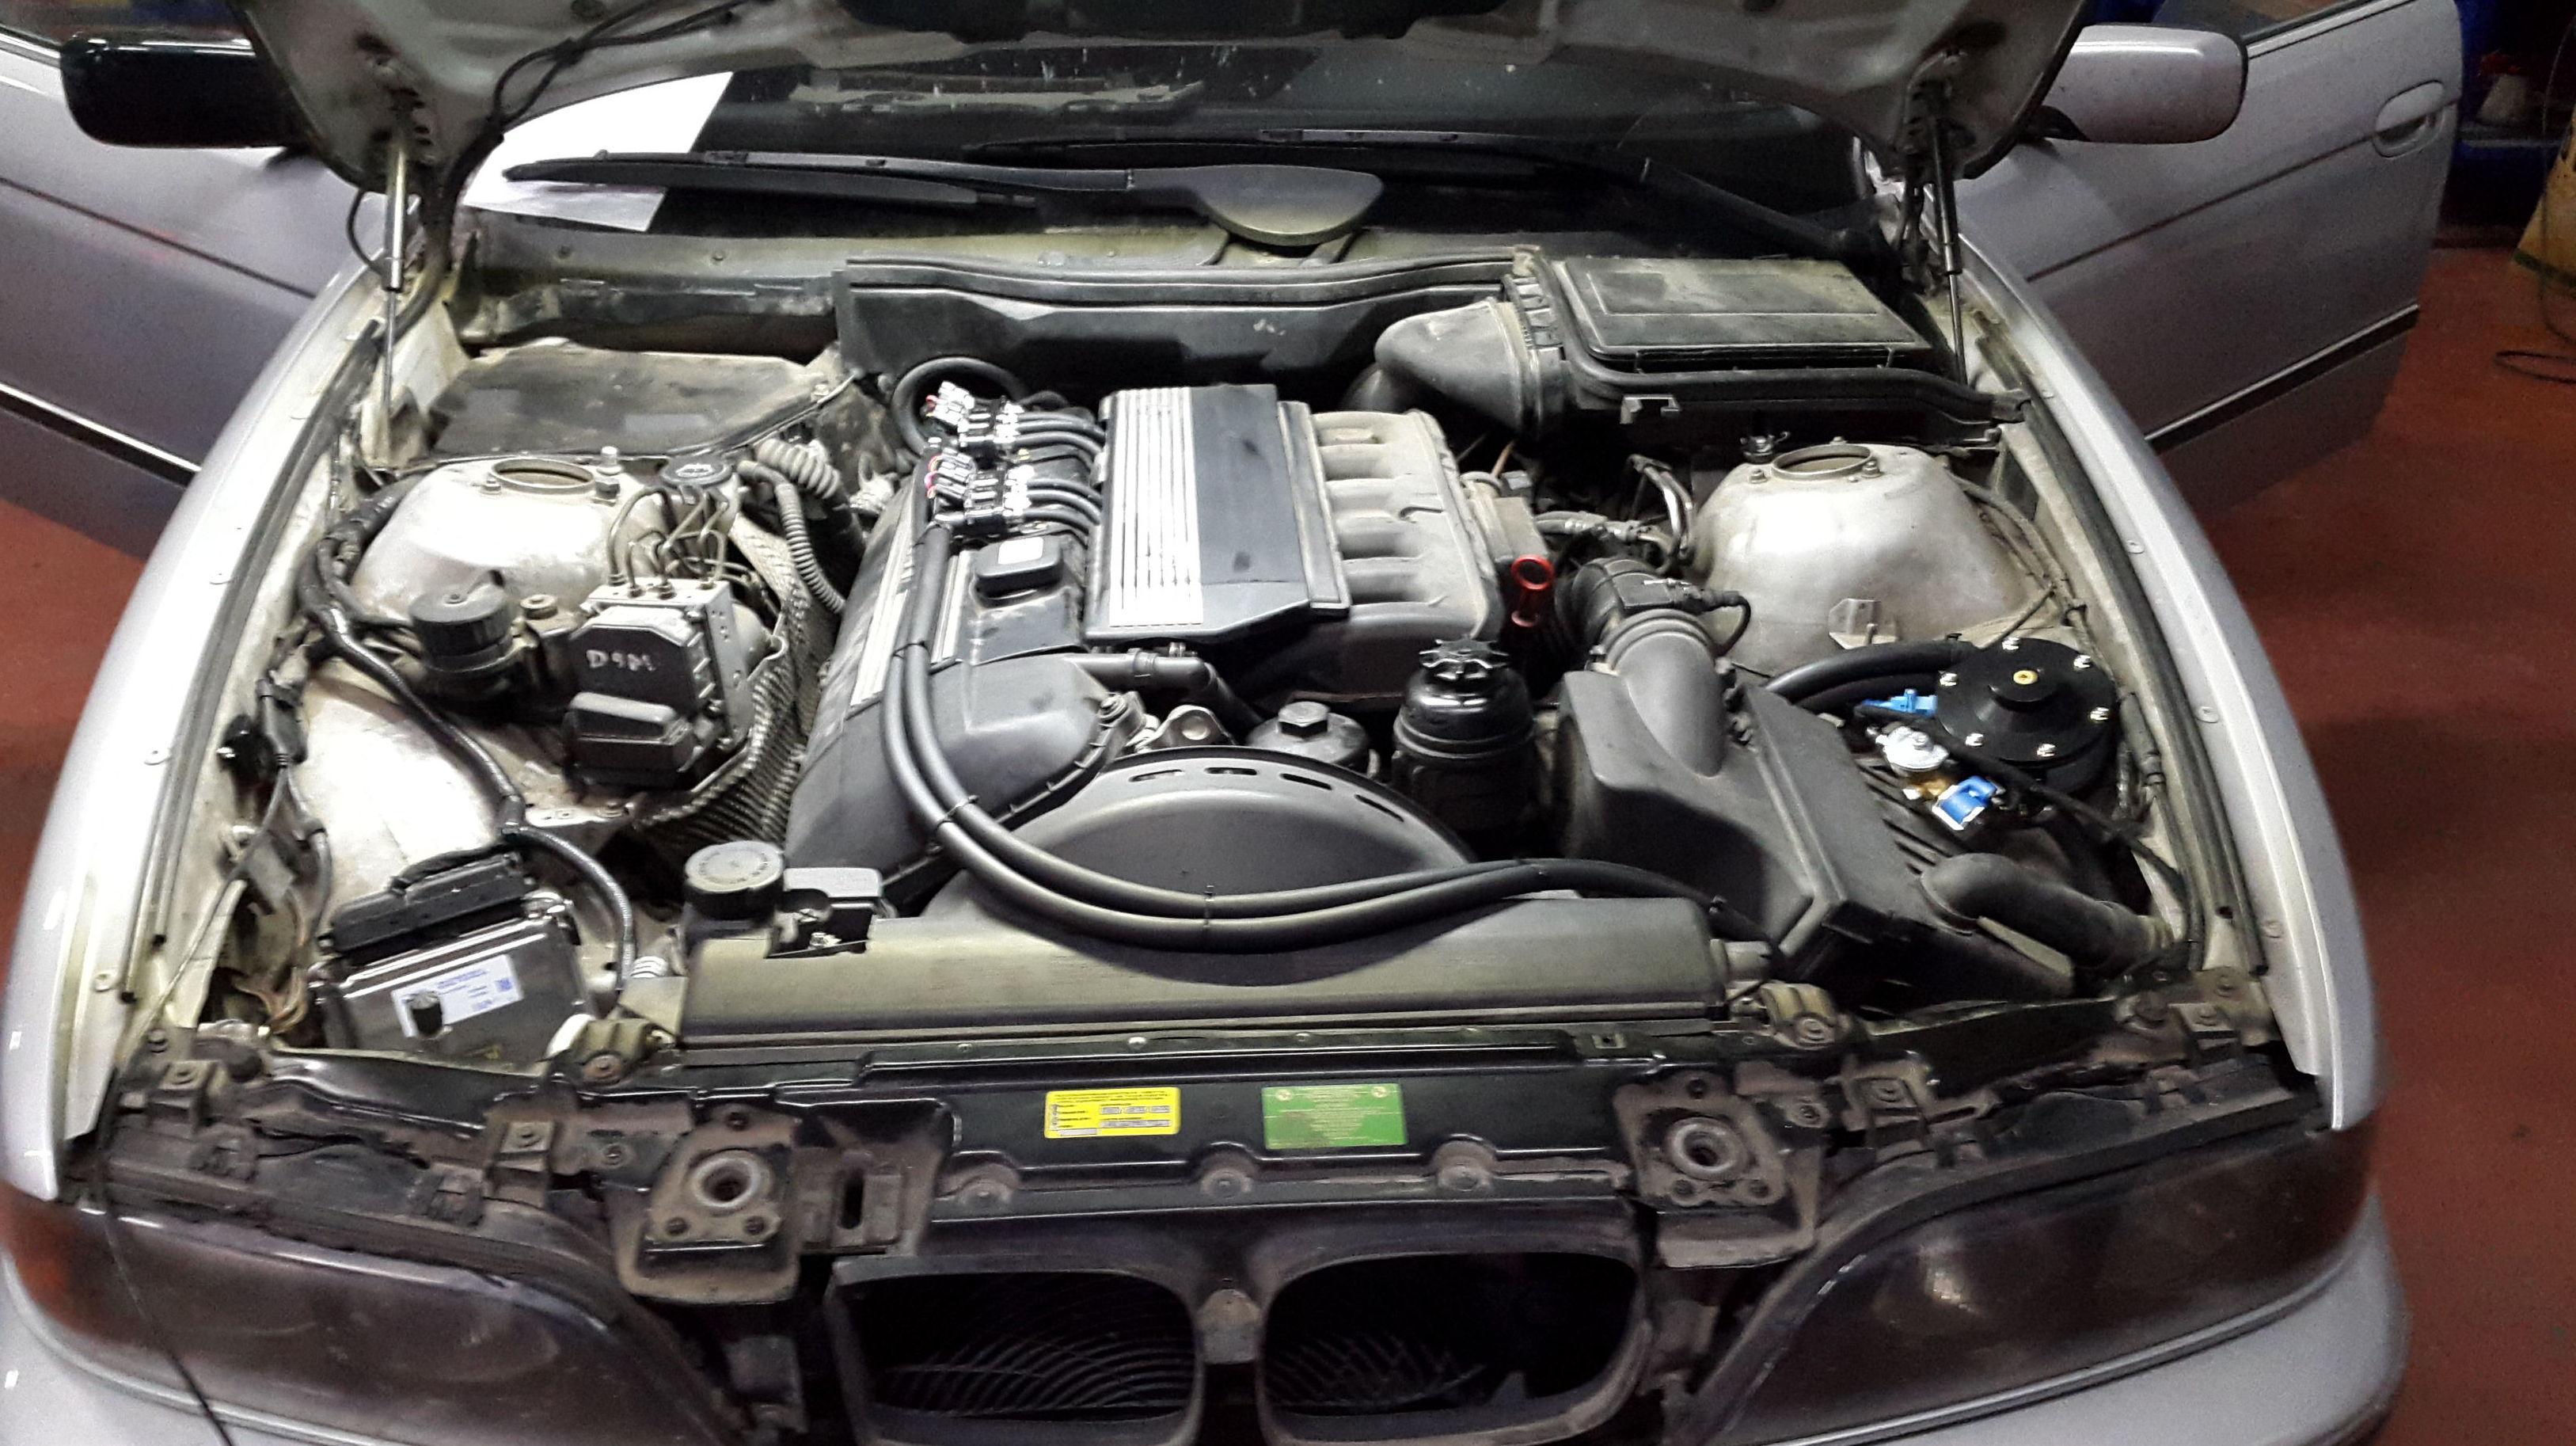 Motor transformado a glp